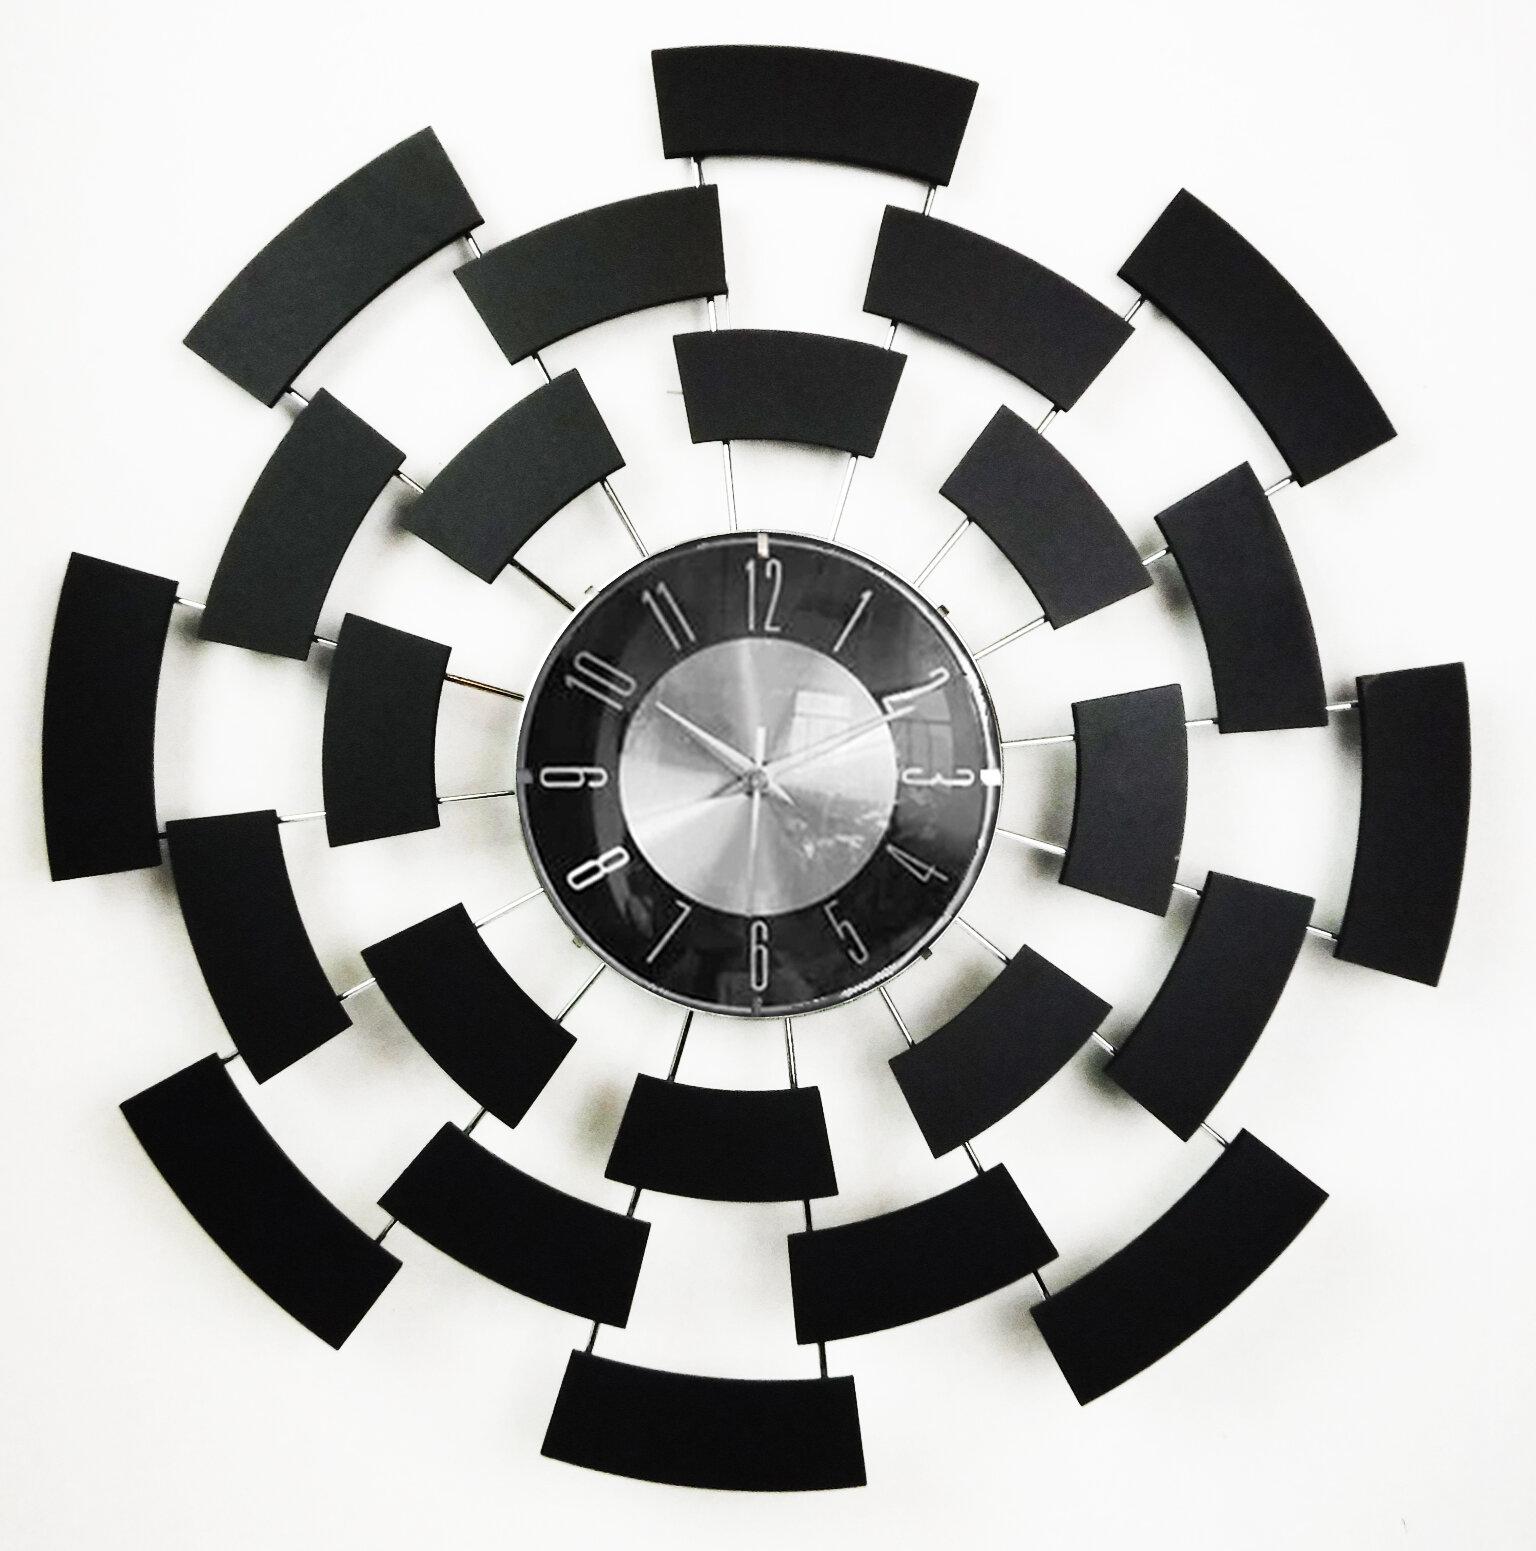 Image of: Mid Century Decor Geometry Wall Clock Reviews Wayfair